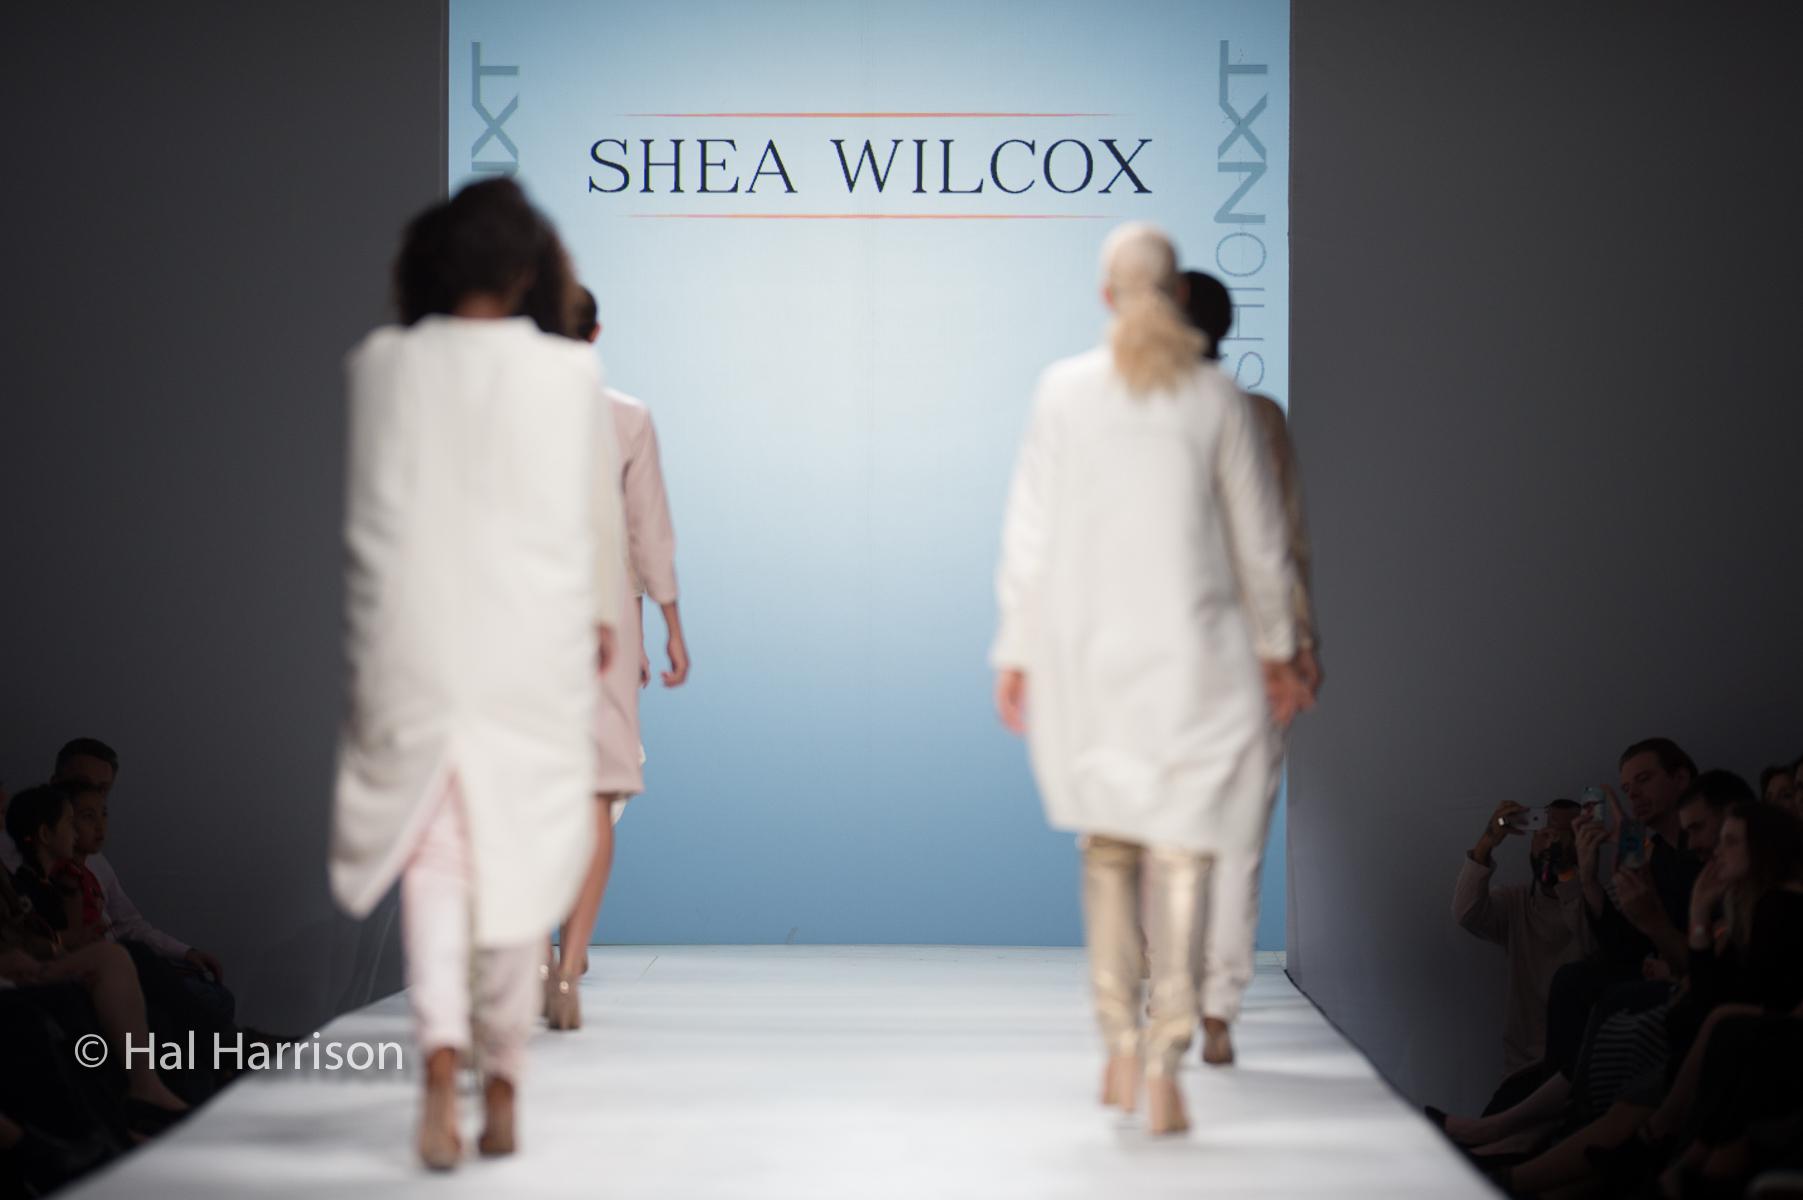 2015 Shea Wilcox 2